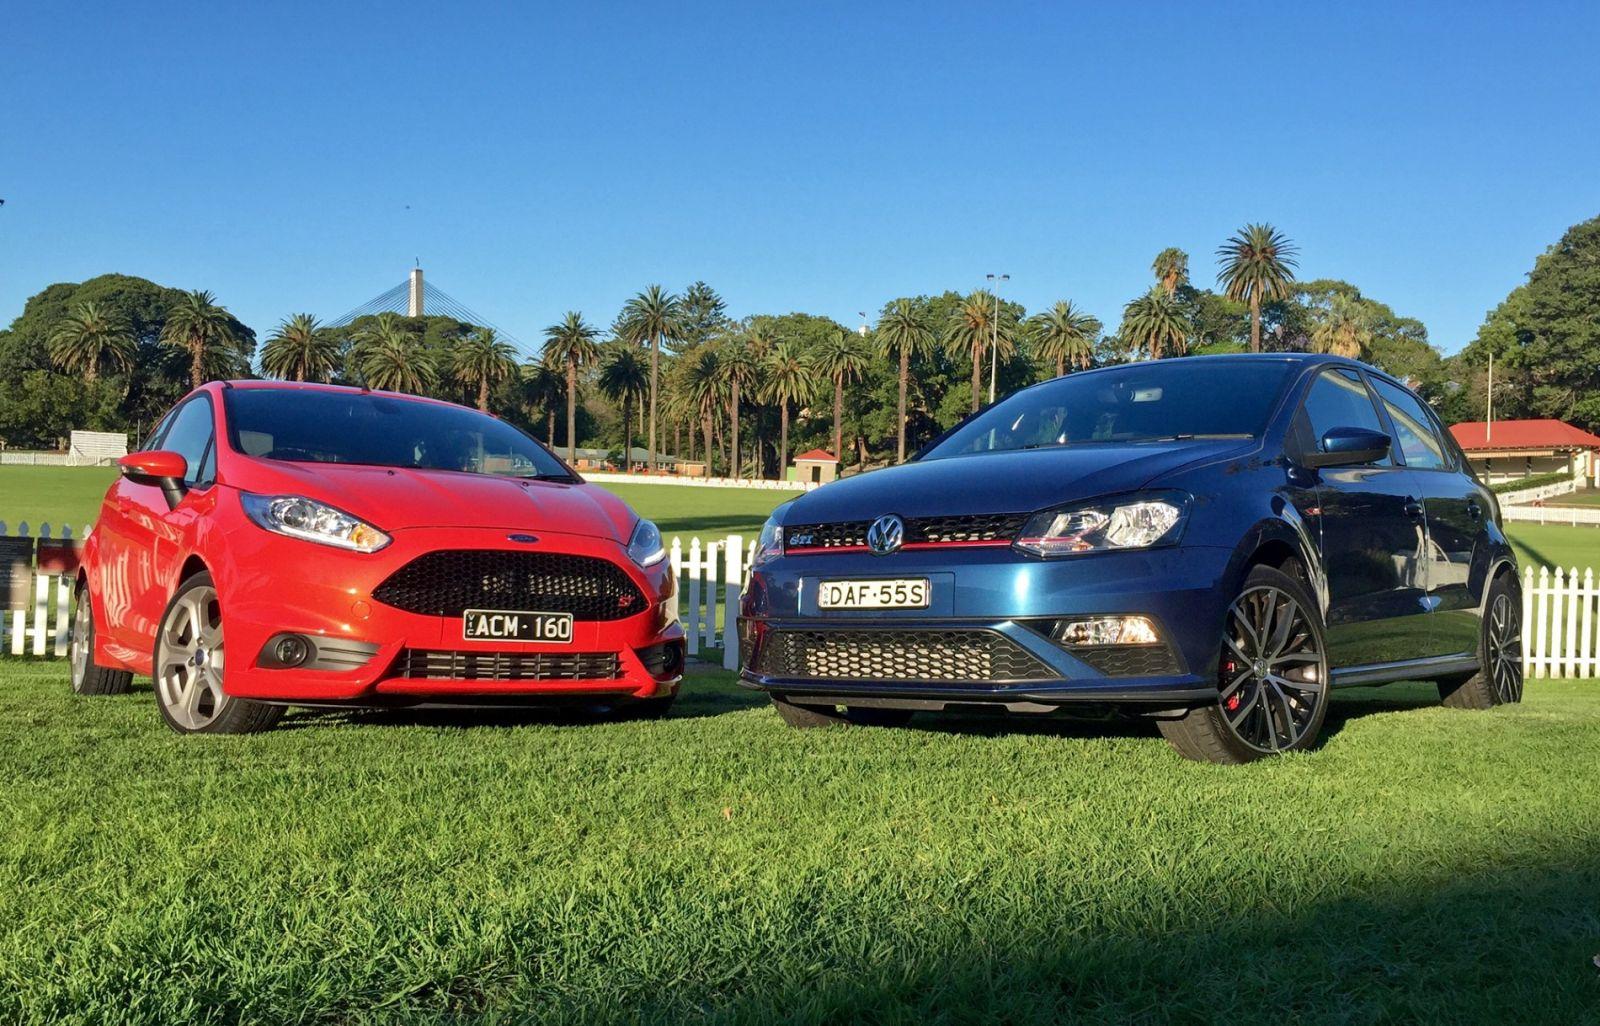 2016 Ford Fiesta ST vs 2016 Volkswagen Polo GTI Comparison REVIEW | The 'Little' Hot-hatch Showdown...